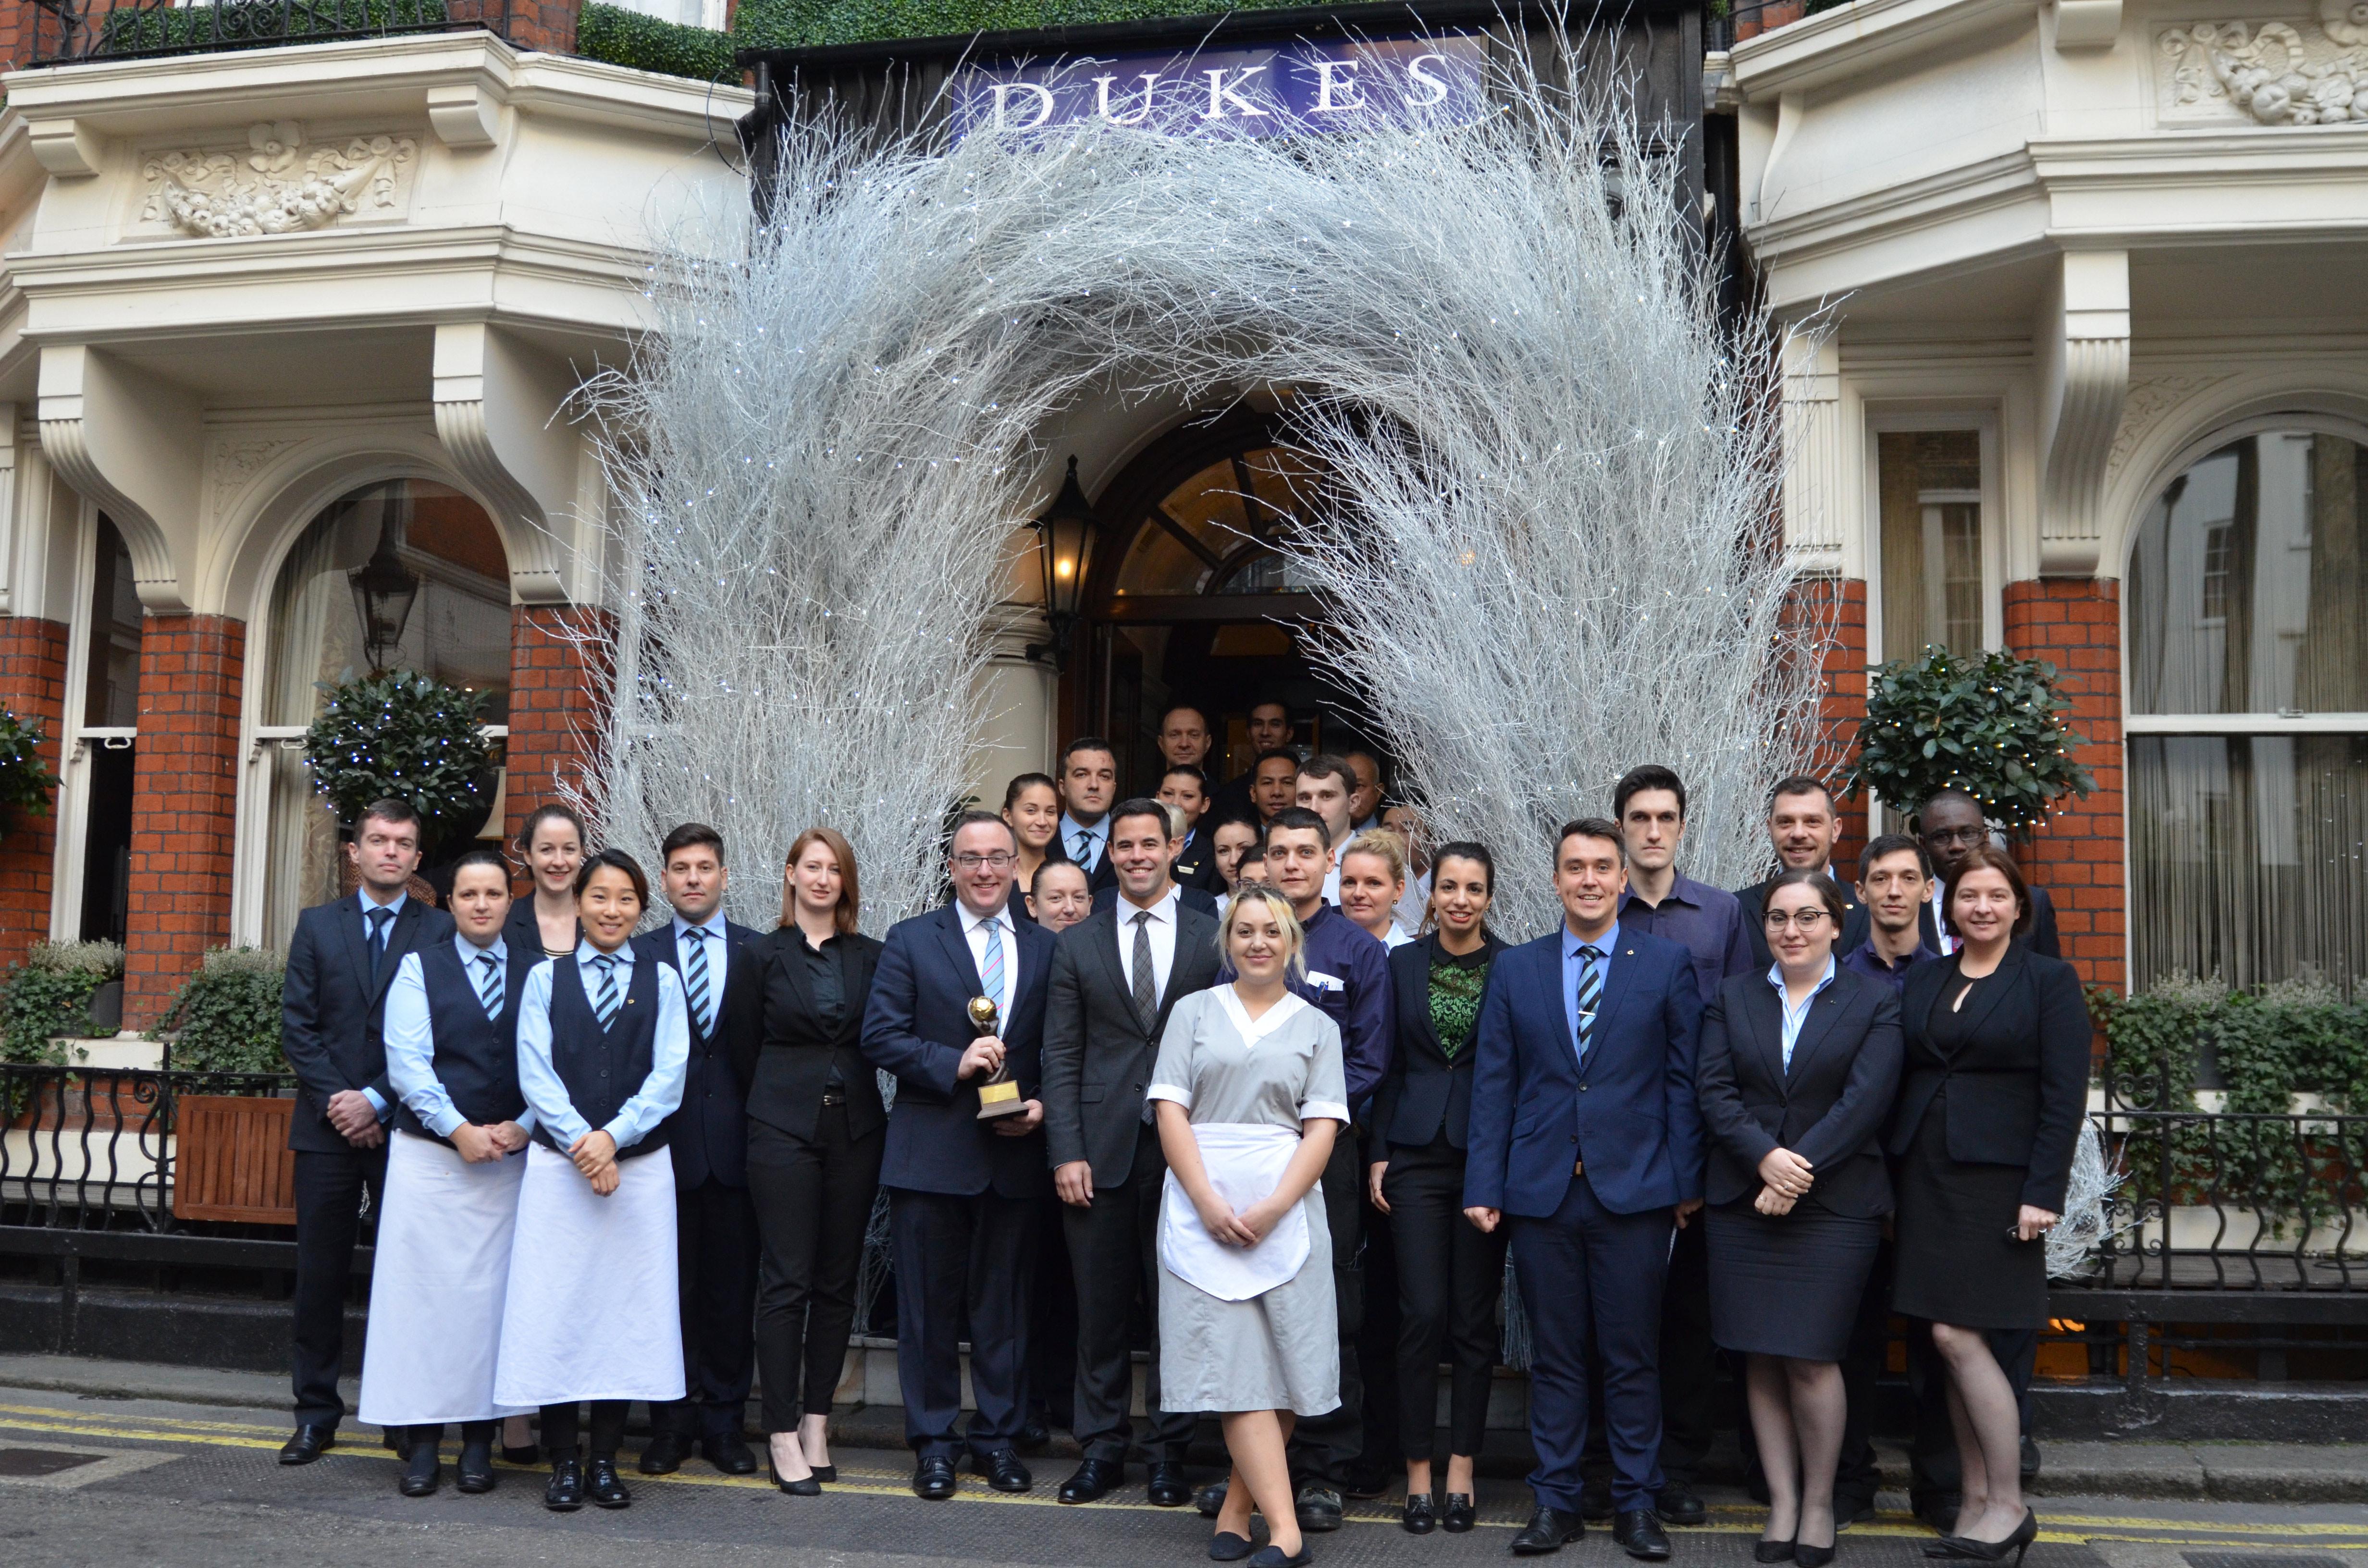 boutique hotels mayfair london england dukes london hotel 2018 world 39 s best hotels